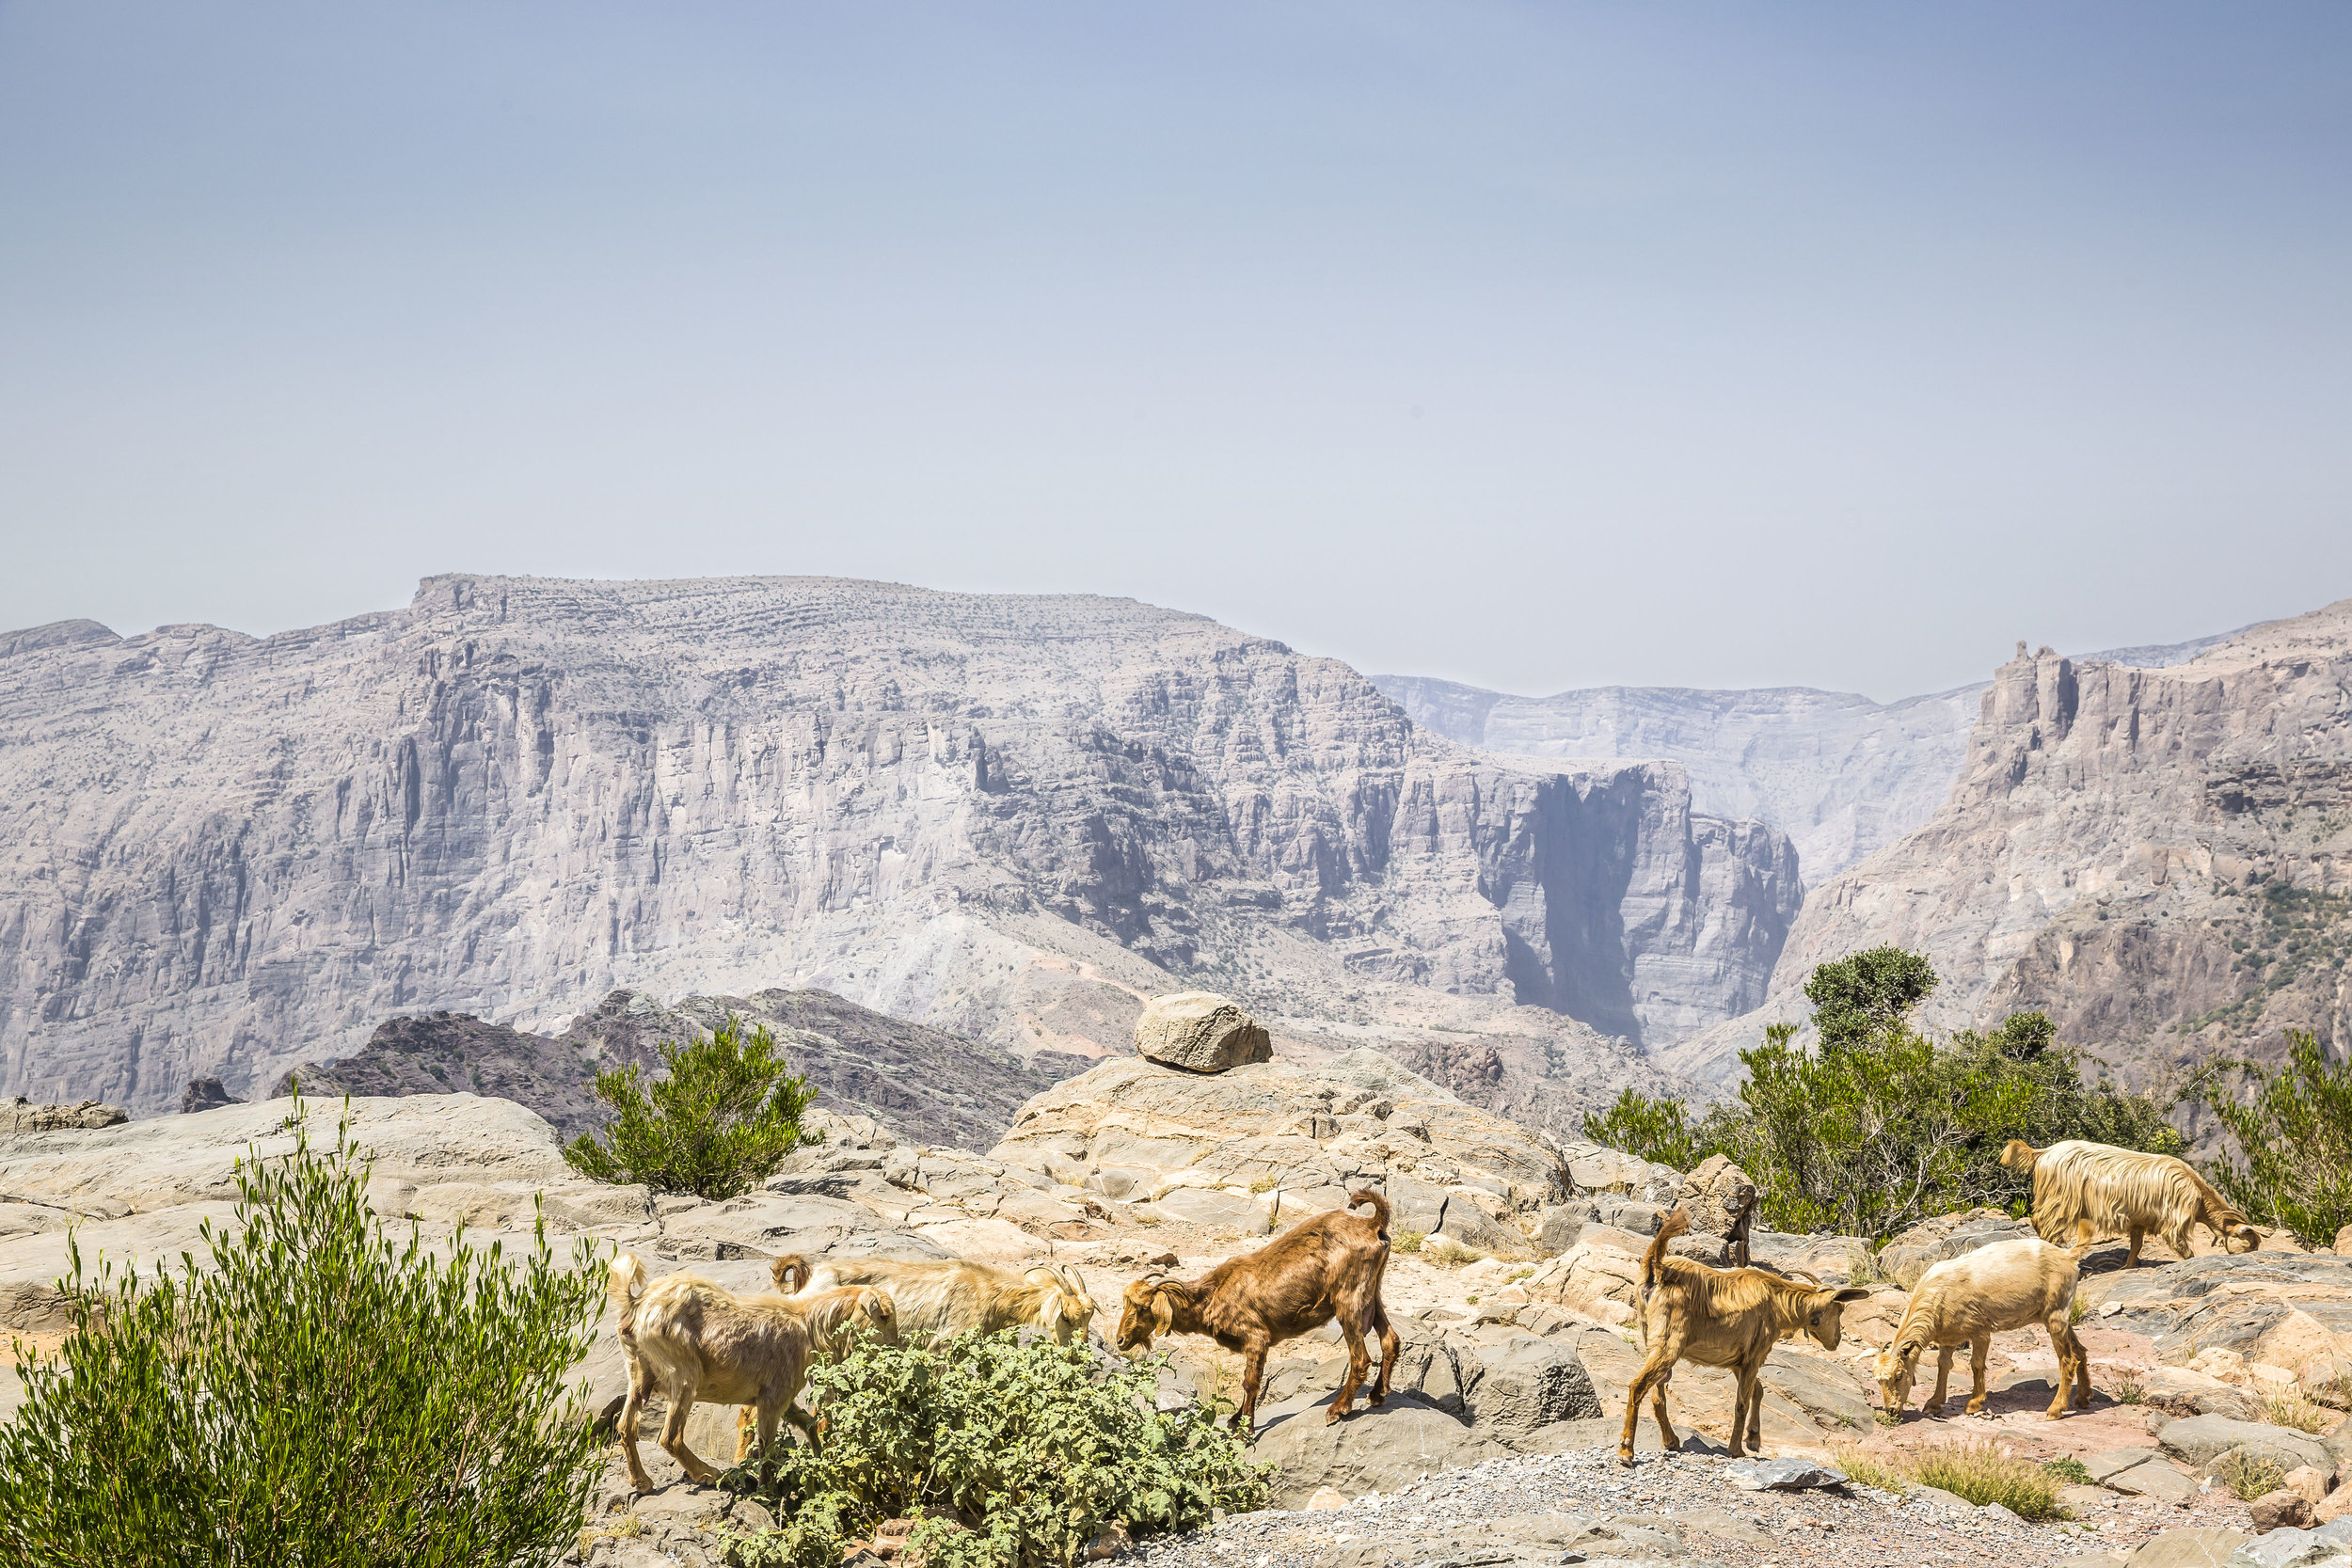 Anantara Al Jabal Al Akhdar Resort - Cliff Pool Villa View 01.jpg